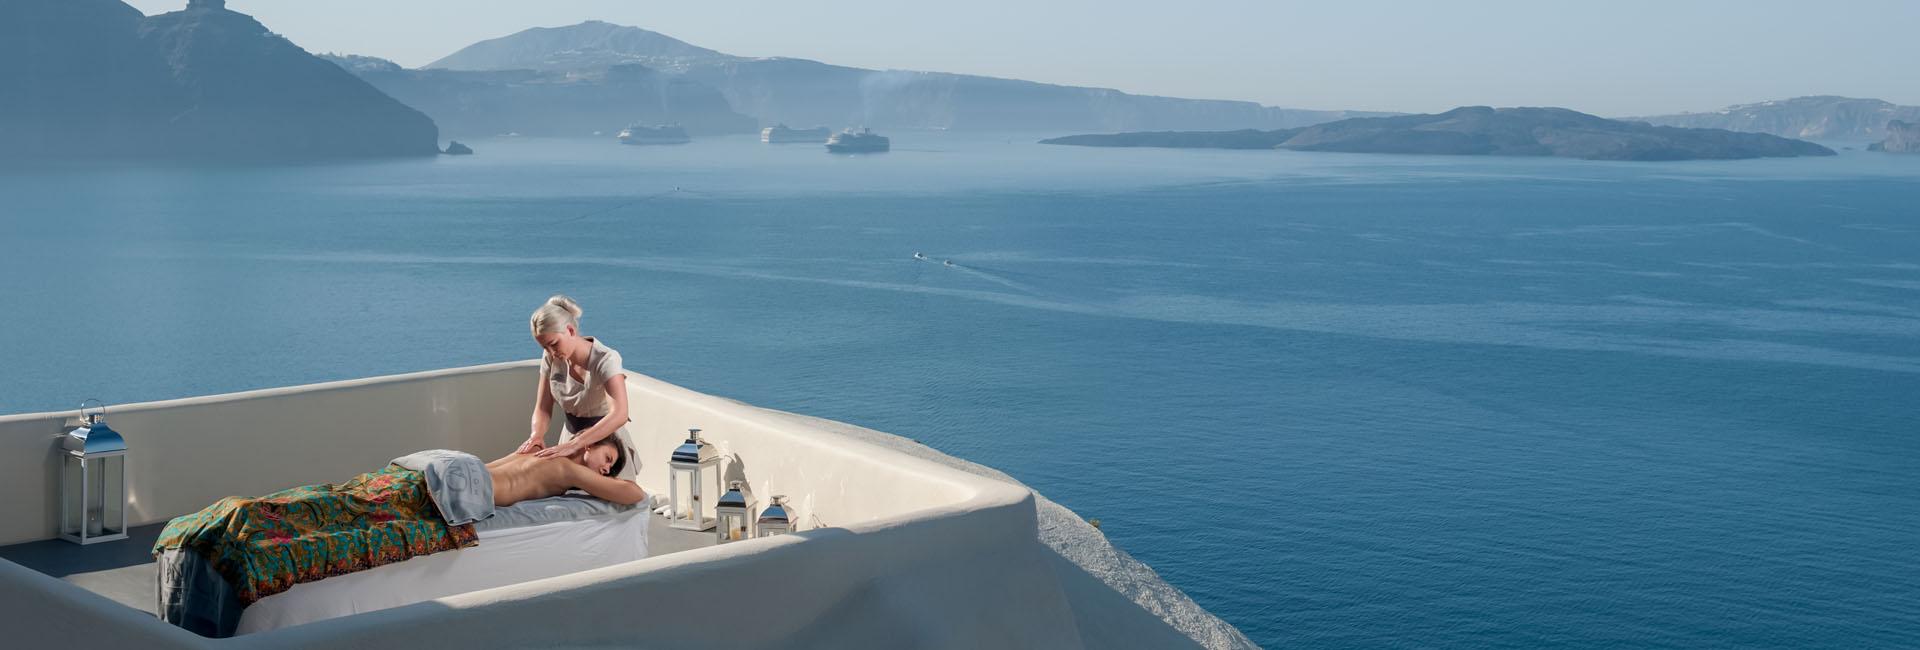 Canaves Oia Santorini Spa